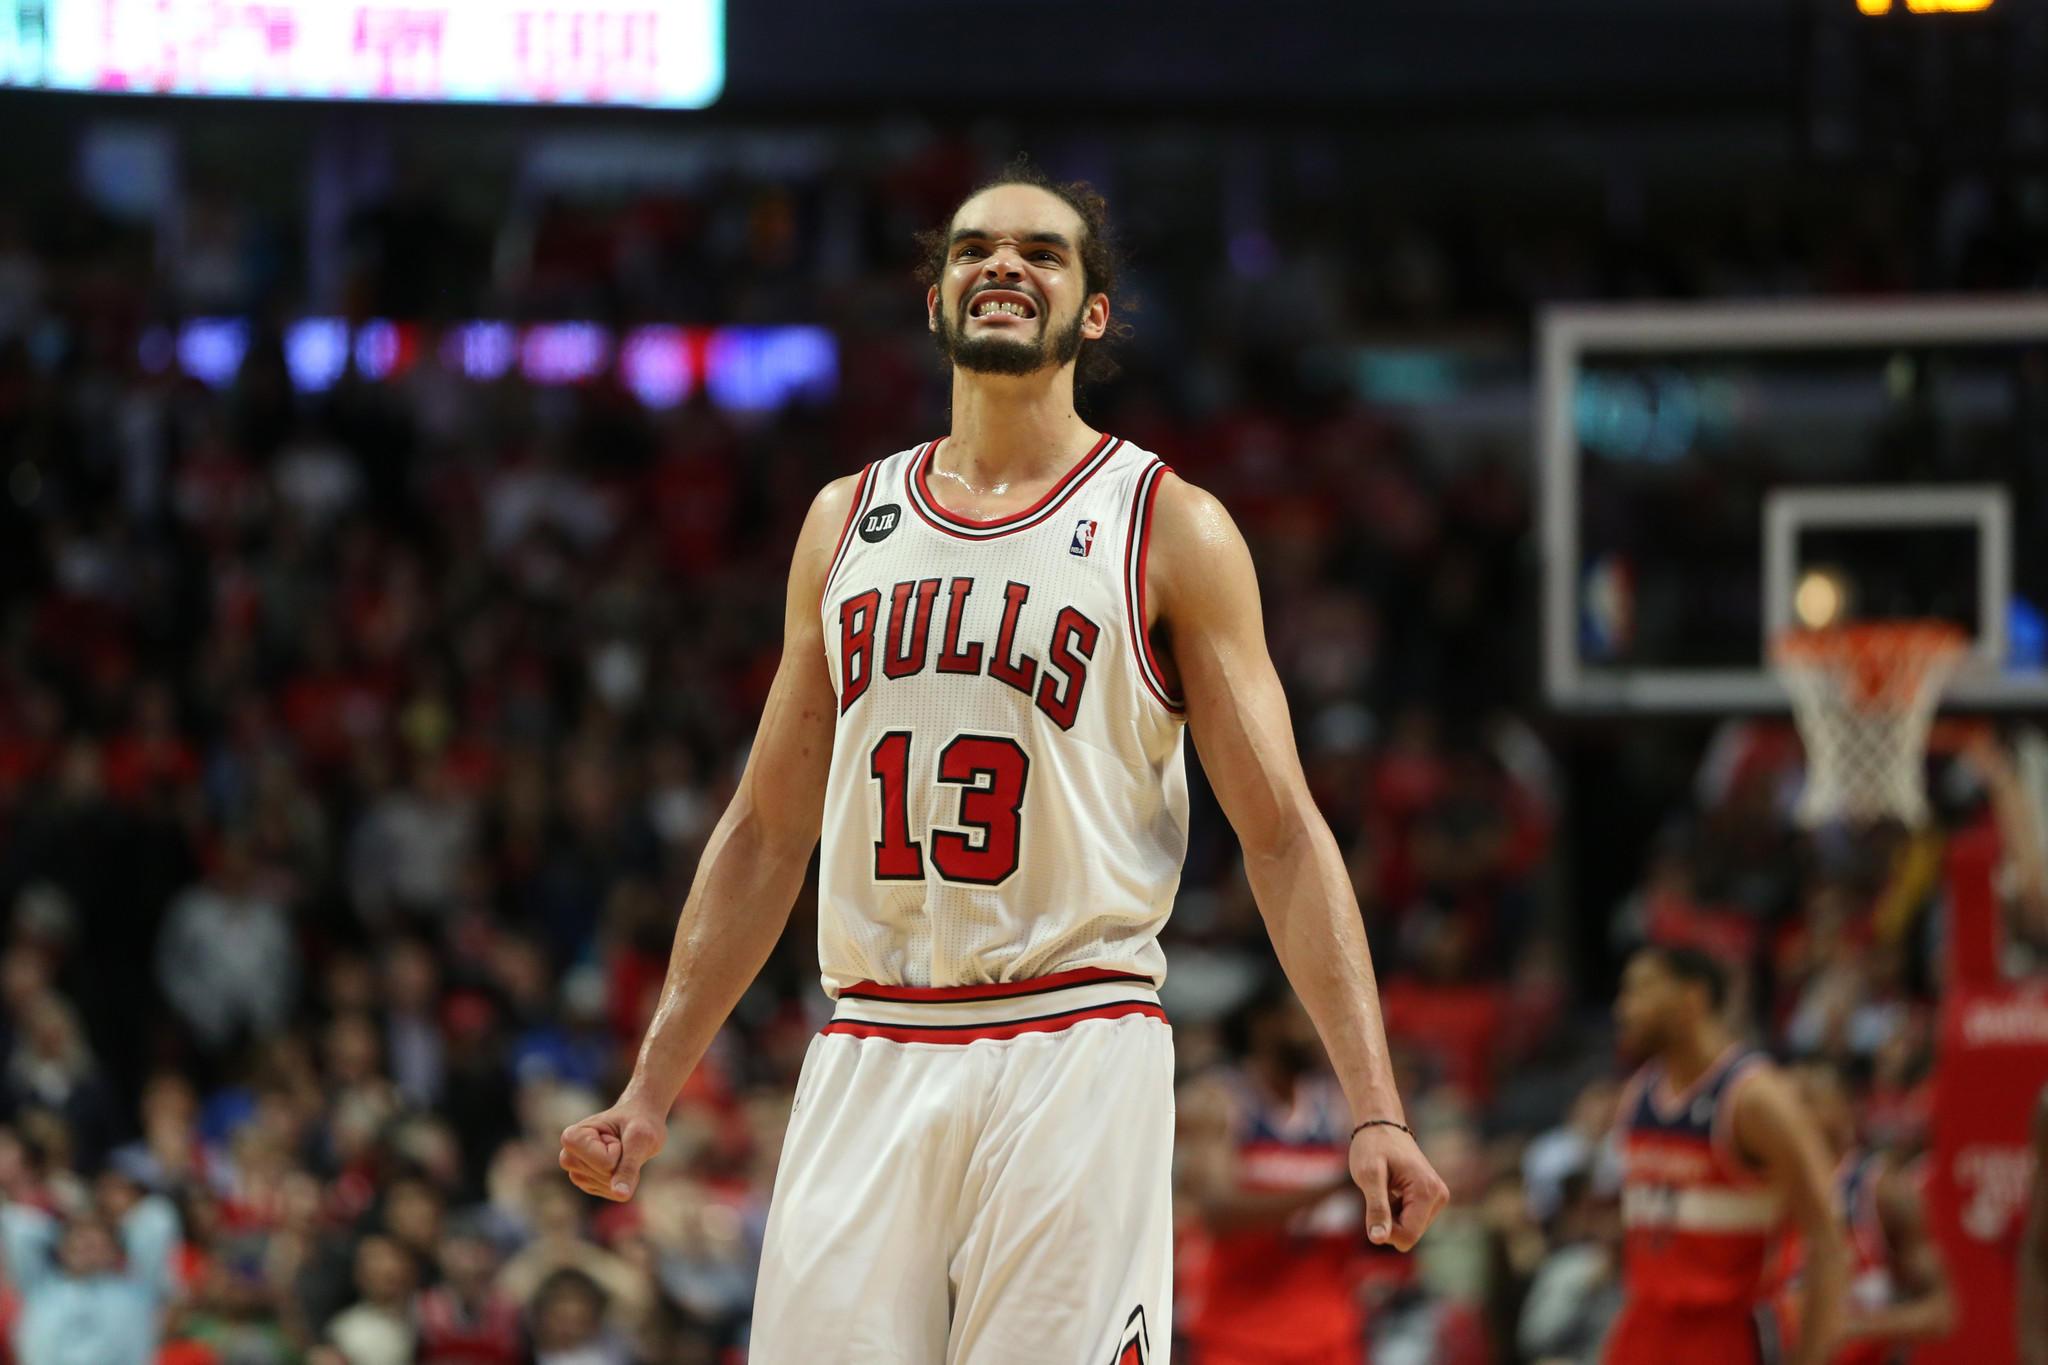 Chicago Bulls center Joakim Noah.